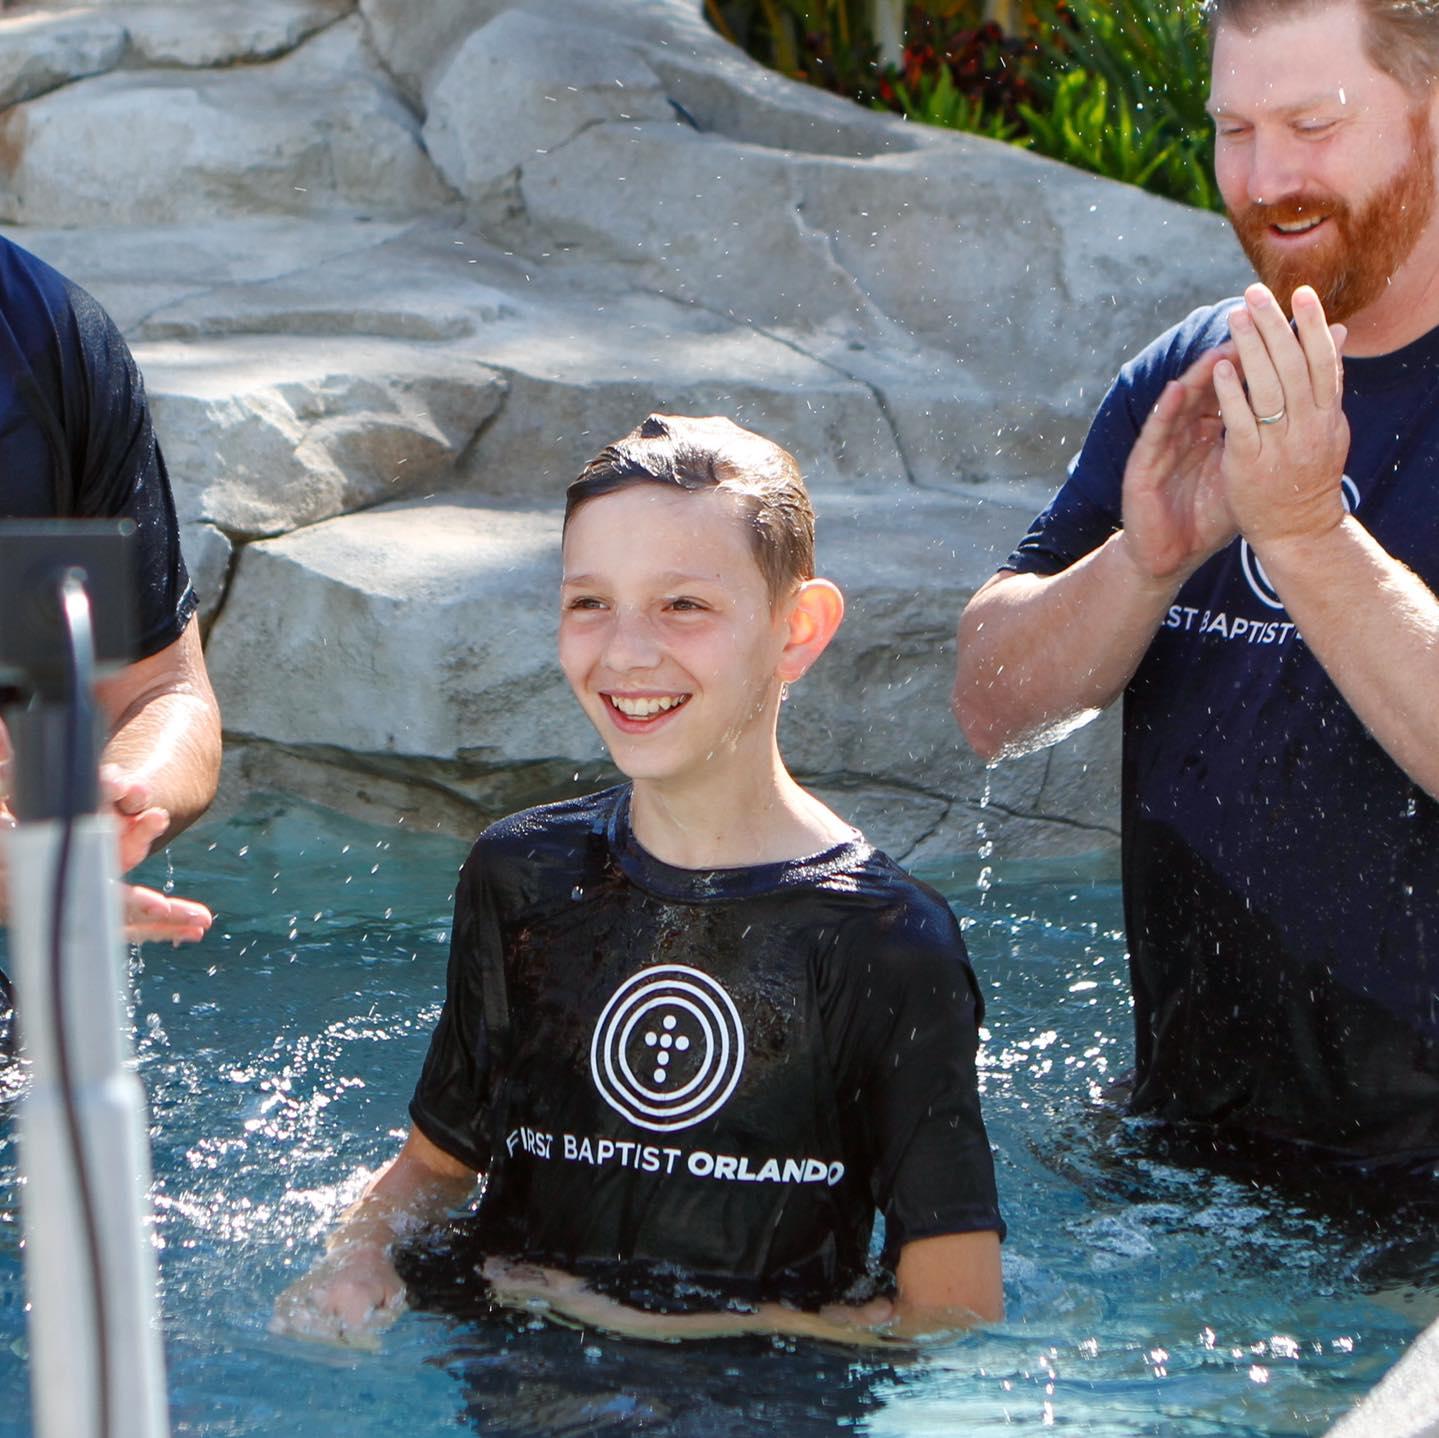 Baptism, First Baptist Church Orlando